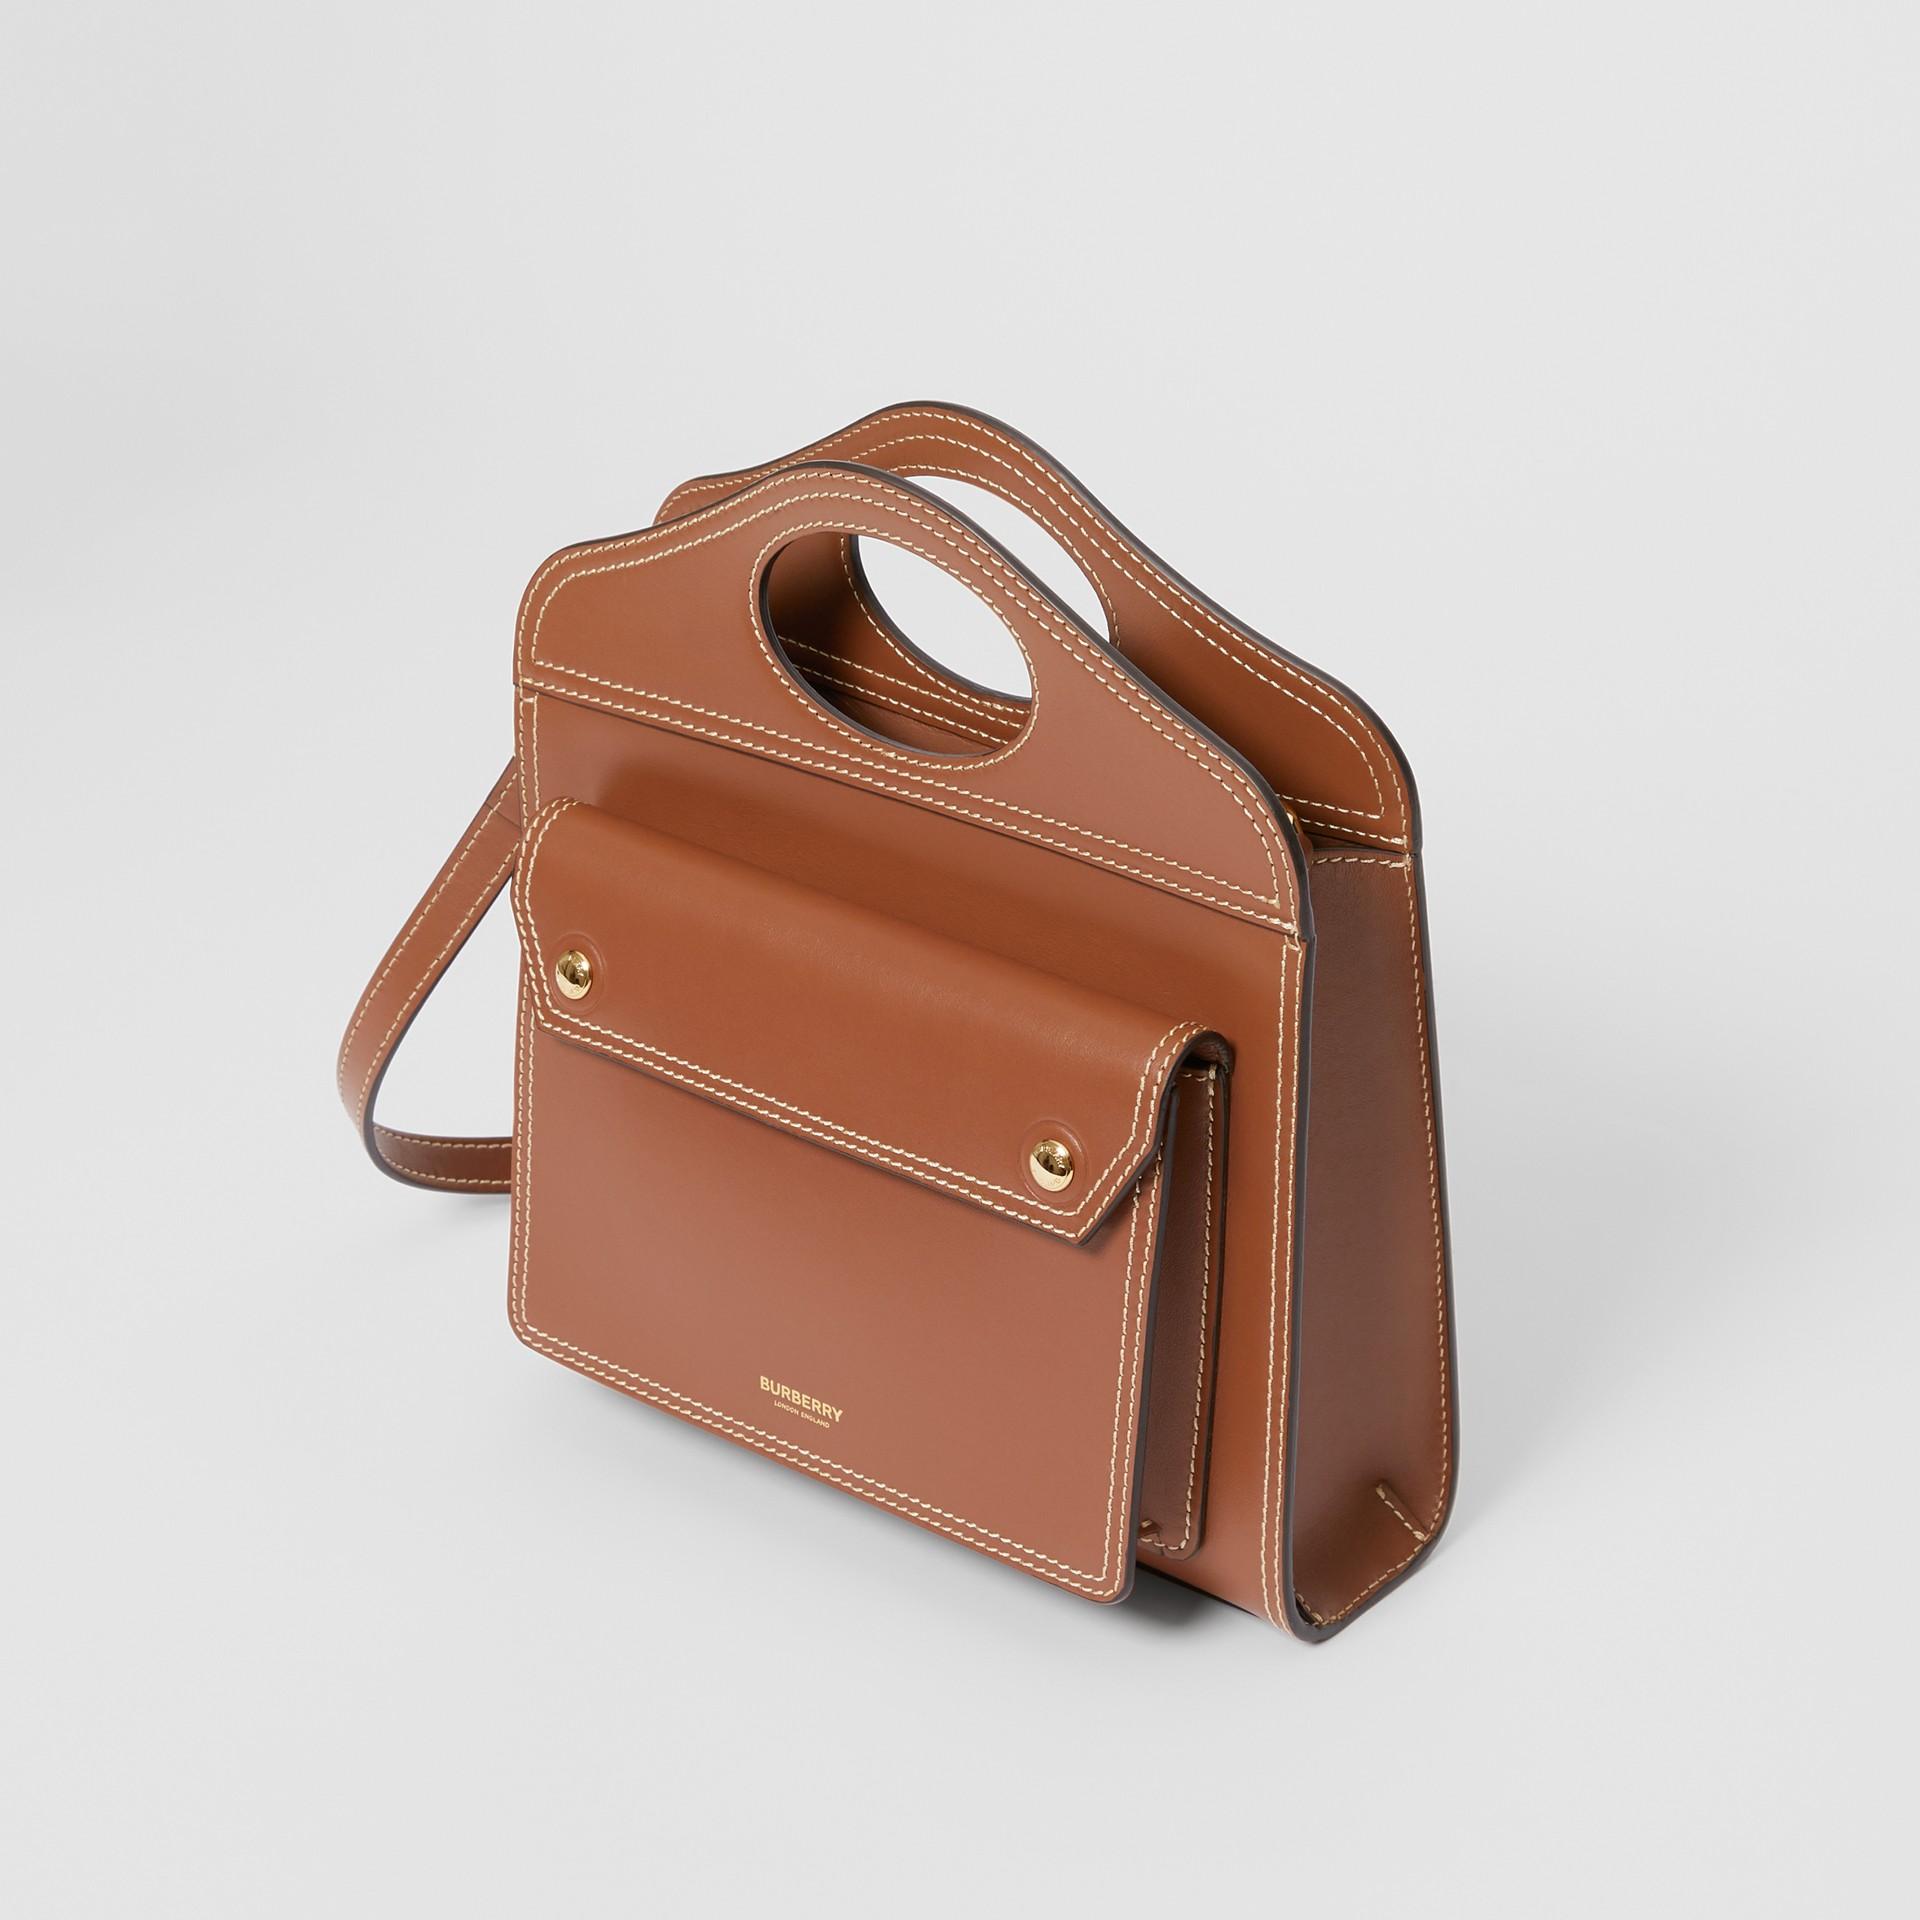 Mini Topstitch Detail Leather Pocket Bag in Malt Brown - Women | Burberry United Kingdom - gallery image 3